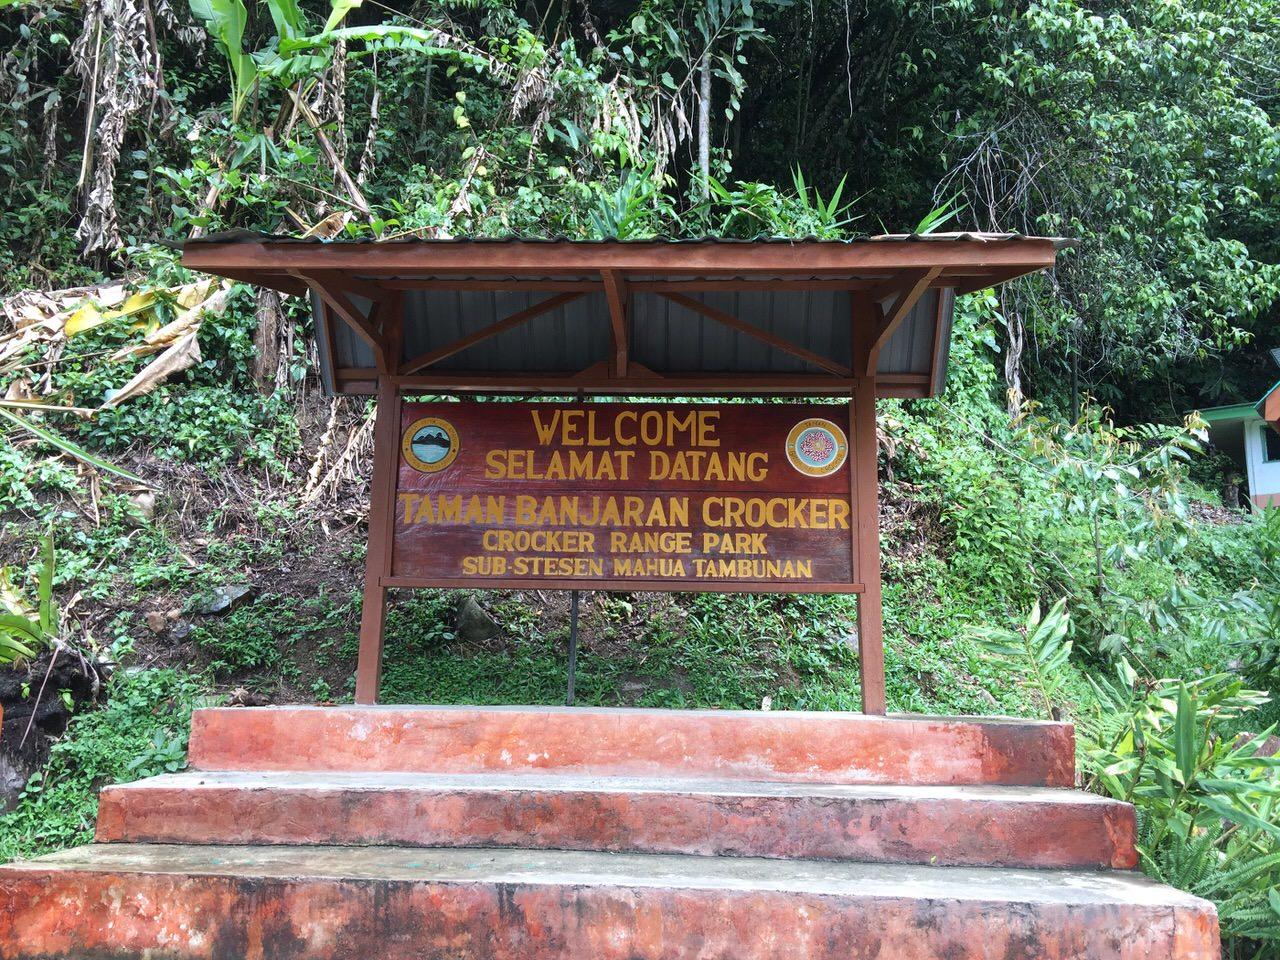 「Mahua Waterfall(マフアの滝)」日本人観光客はほとんど訪れていないだろうコタキナバルの名瀑 #マレーシア #サバ州